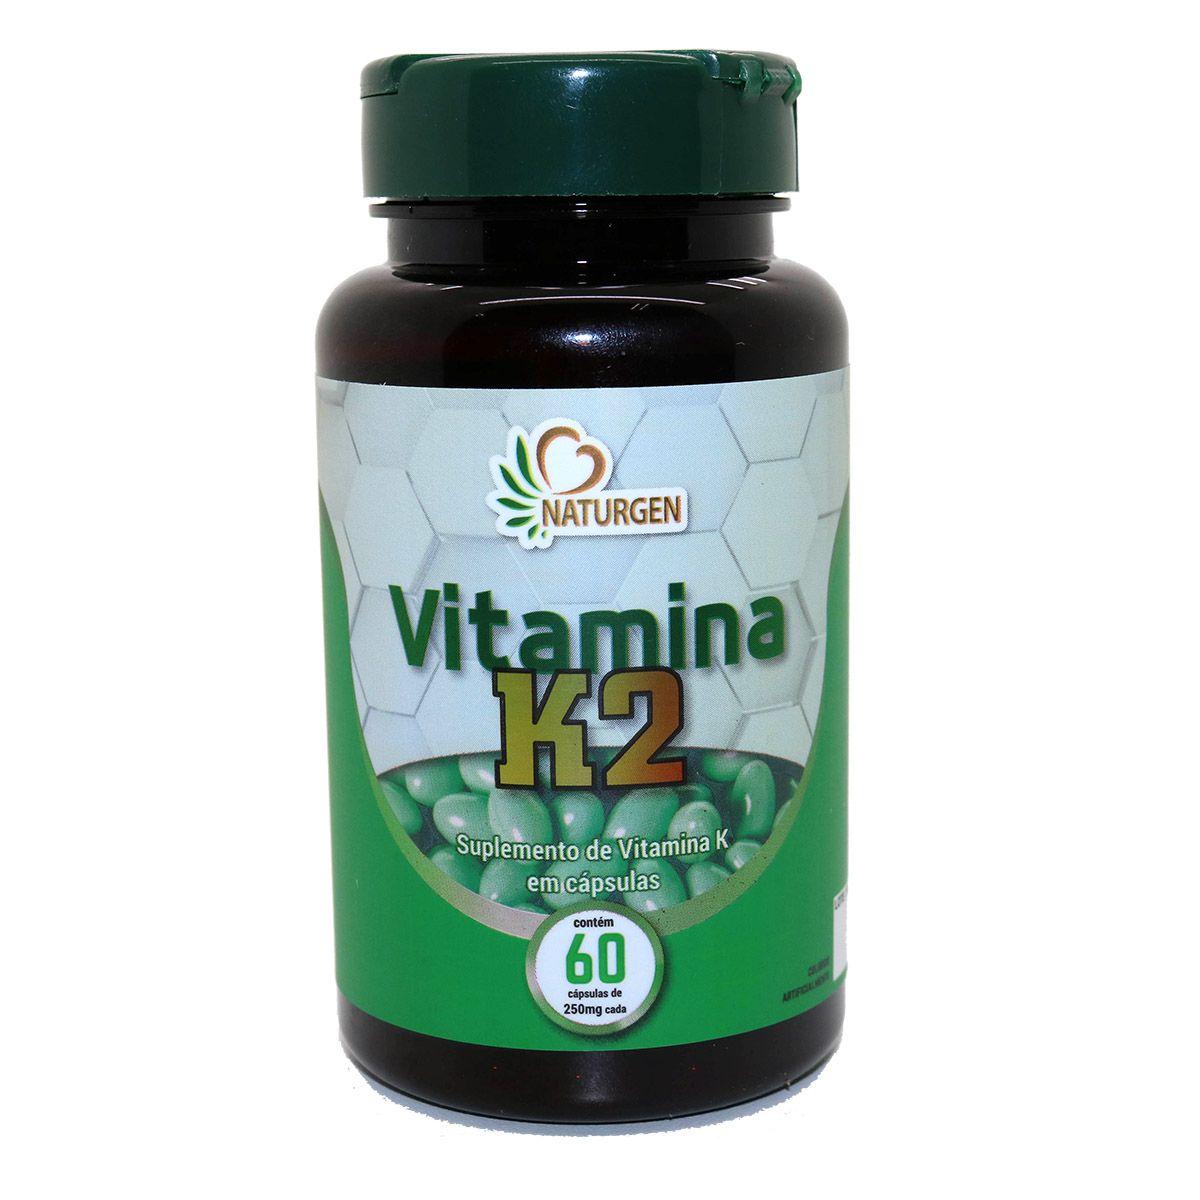 Vitamina K2 Menaquinona MK7 250 MG 60 caps 2 meses